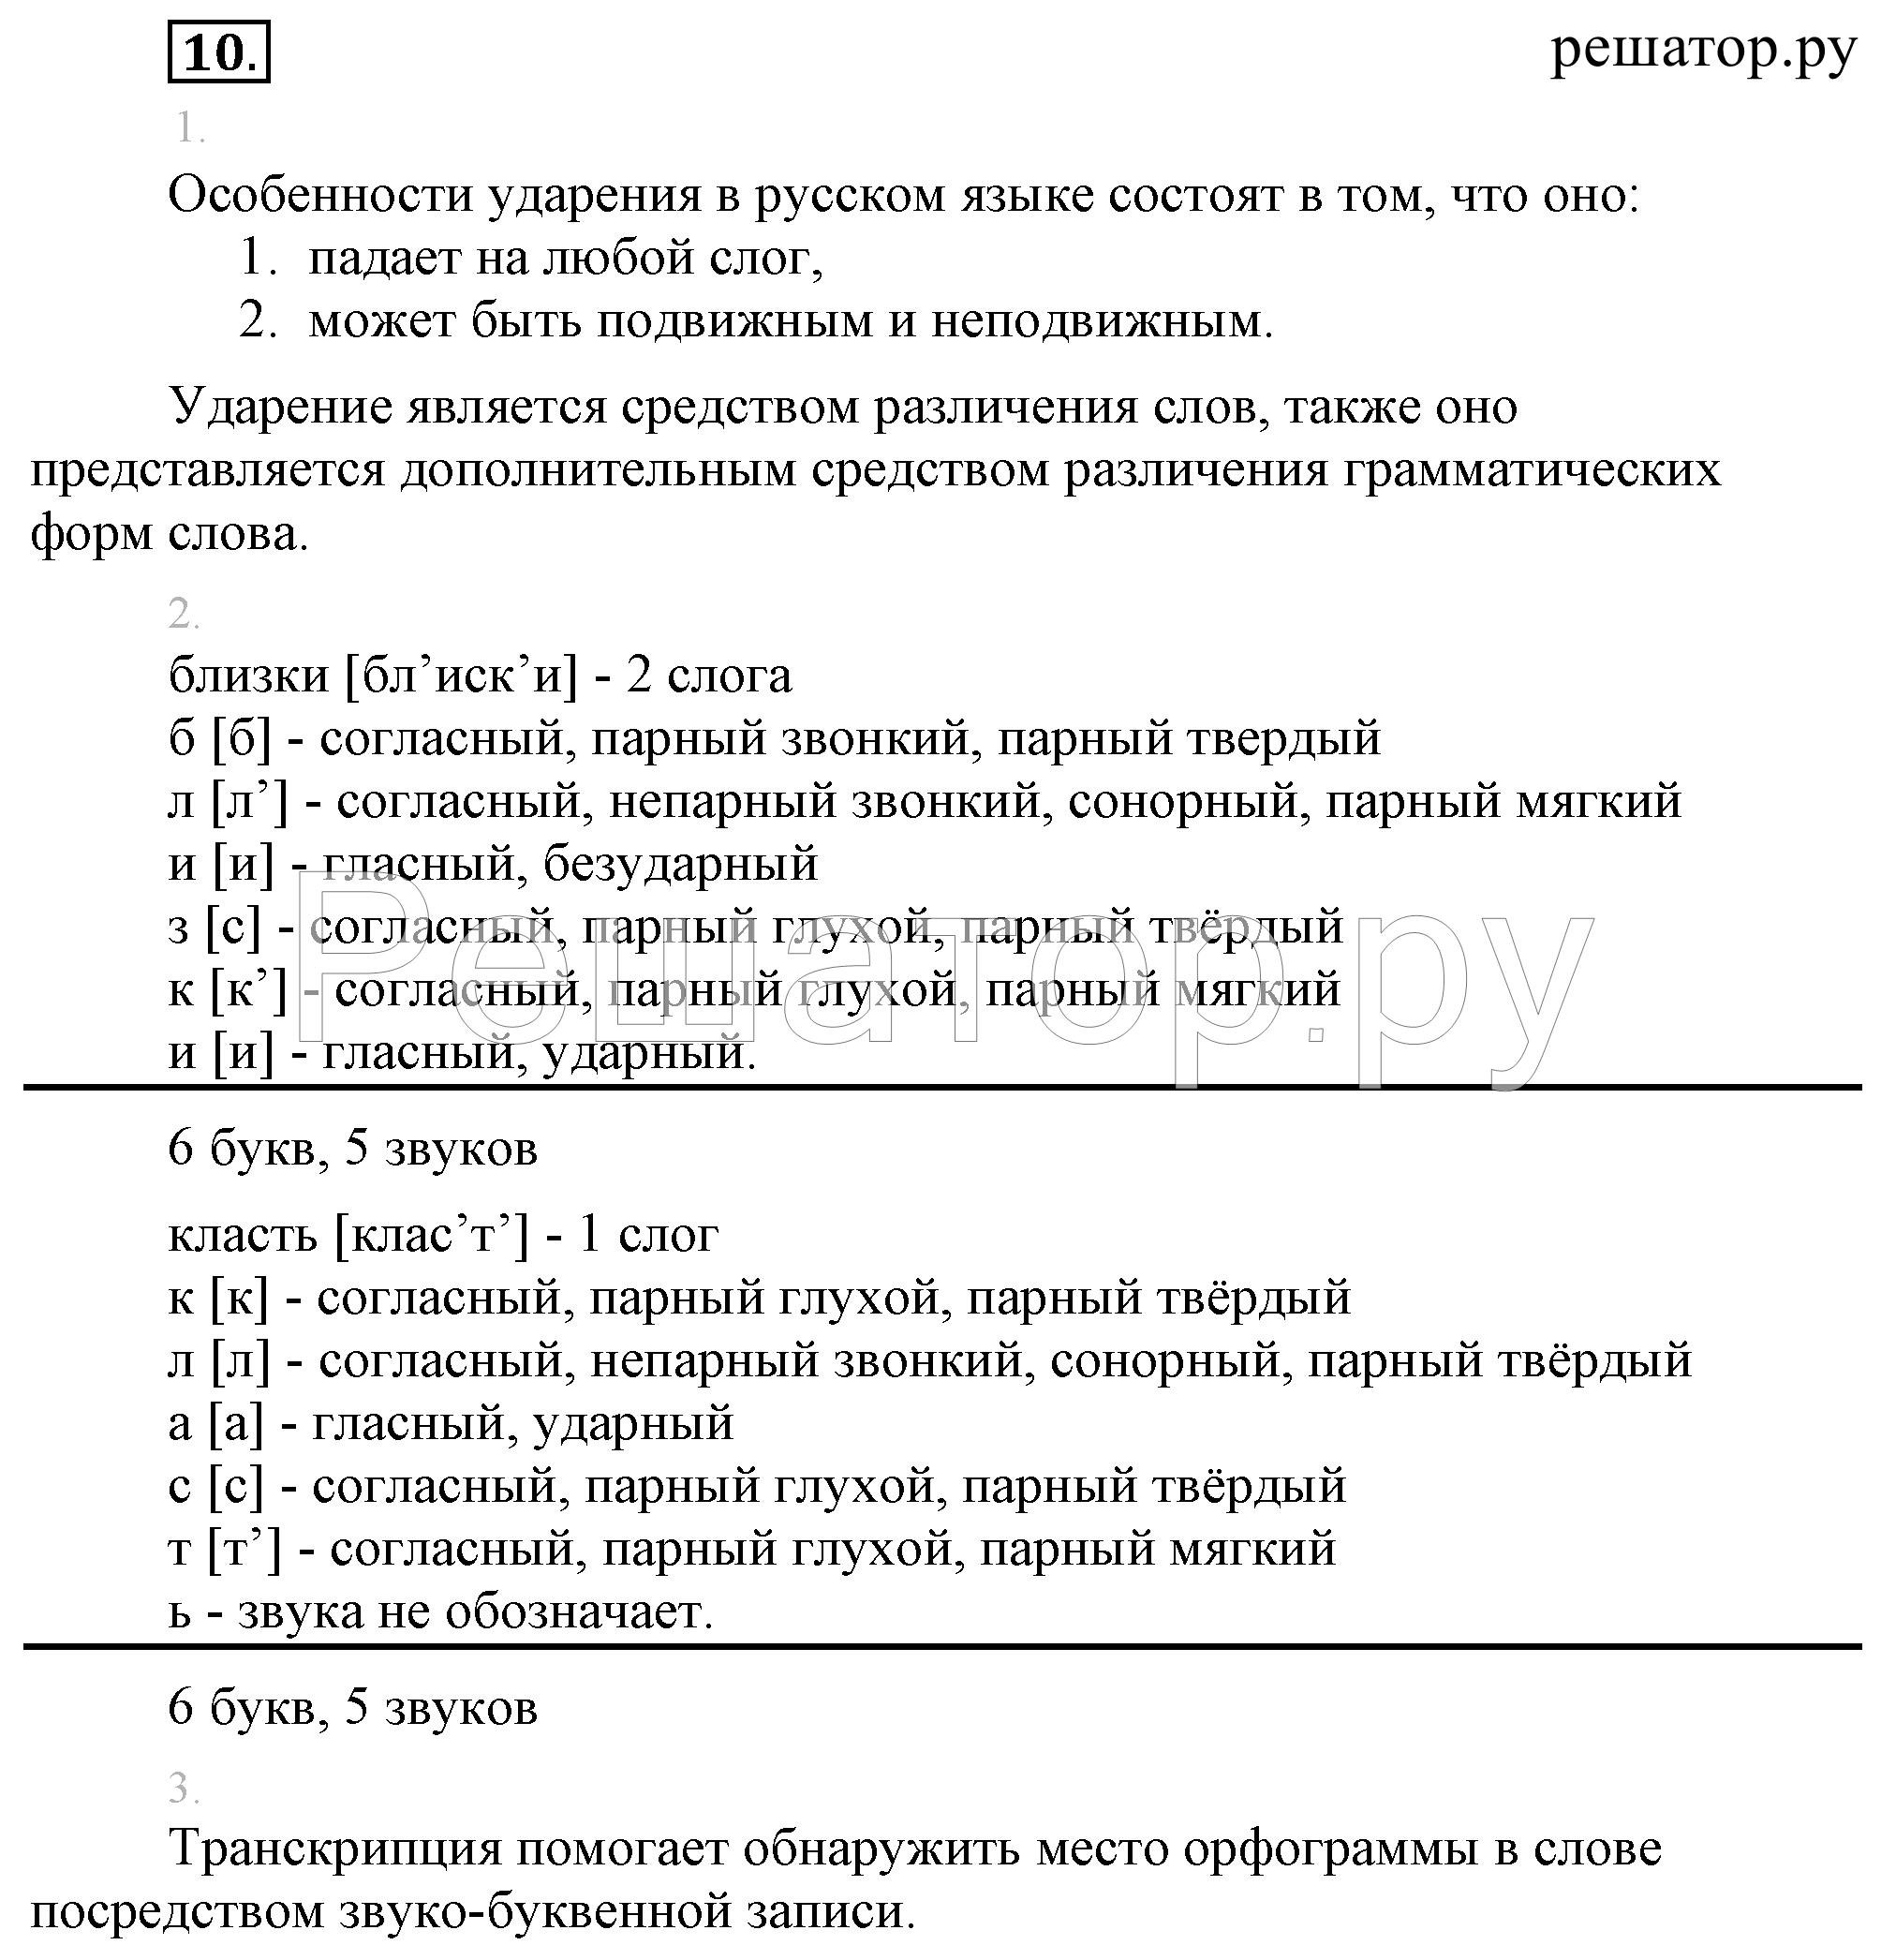 Решебник по русскому 10 класс бунеев онлайн